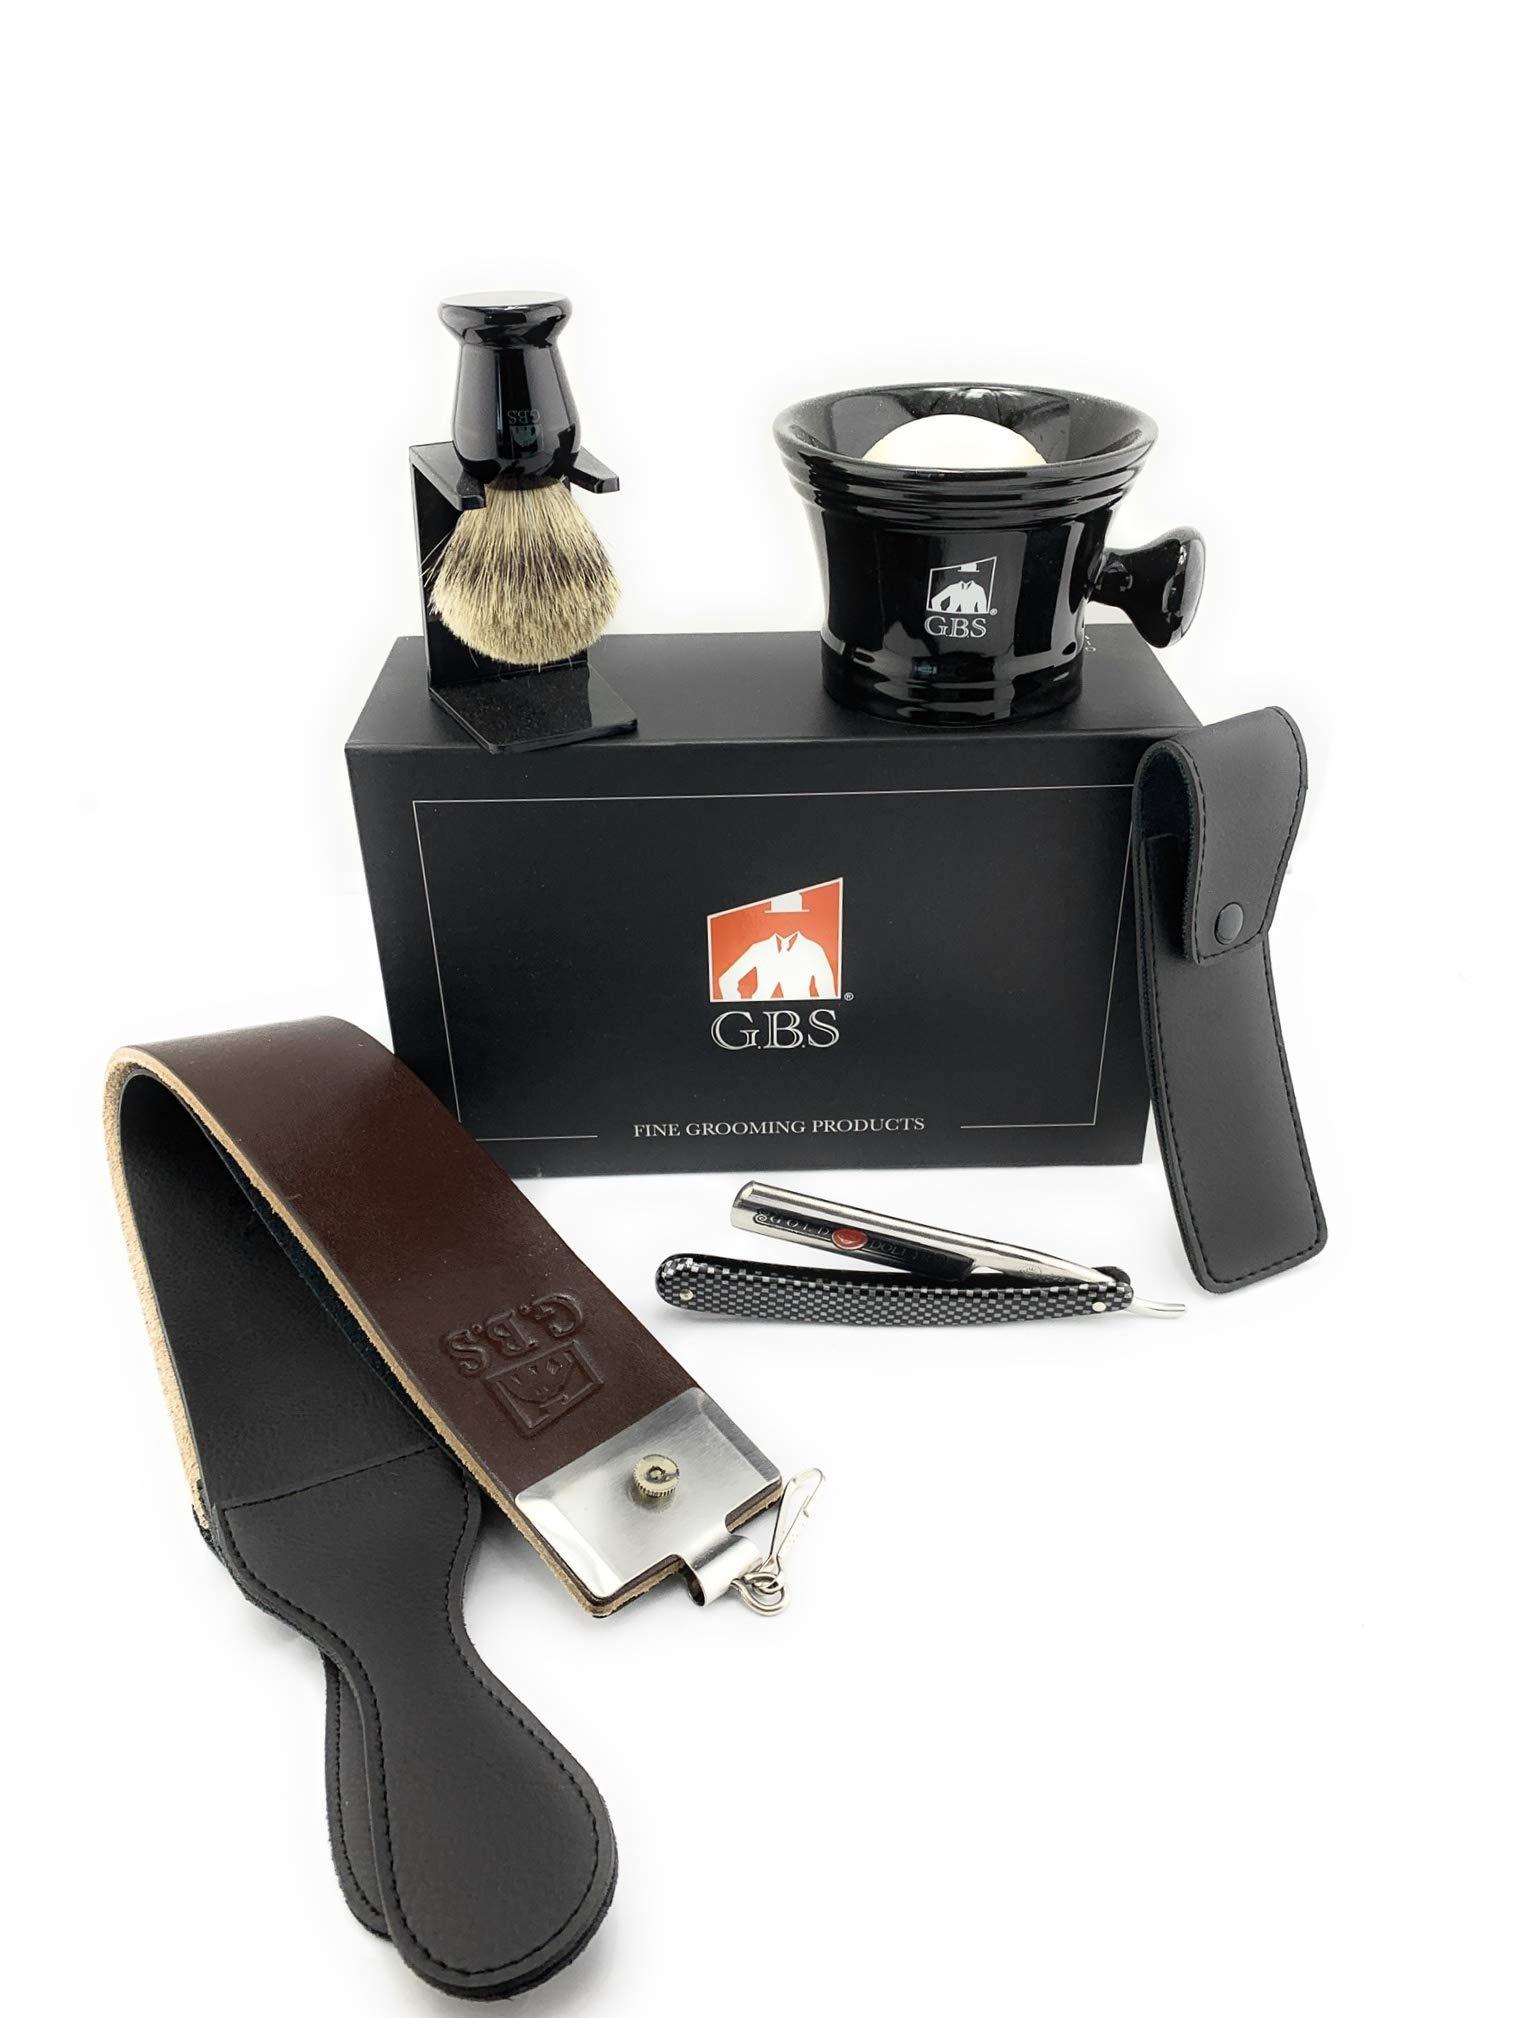 "GBS Men's Gift Set - Shave Ready Gold Dollar Straight Razor 5/8"" Carbon Steel Razor w/Faux Carbon Fiber Handle Include Shaving Mug, Pure Badge Brush, Stand Natural Shaving Soap, Razor Case & Strop"